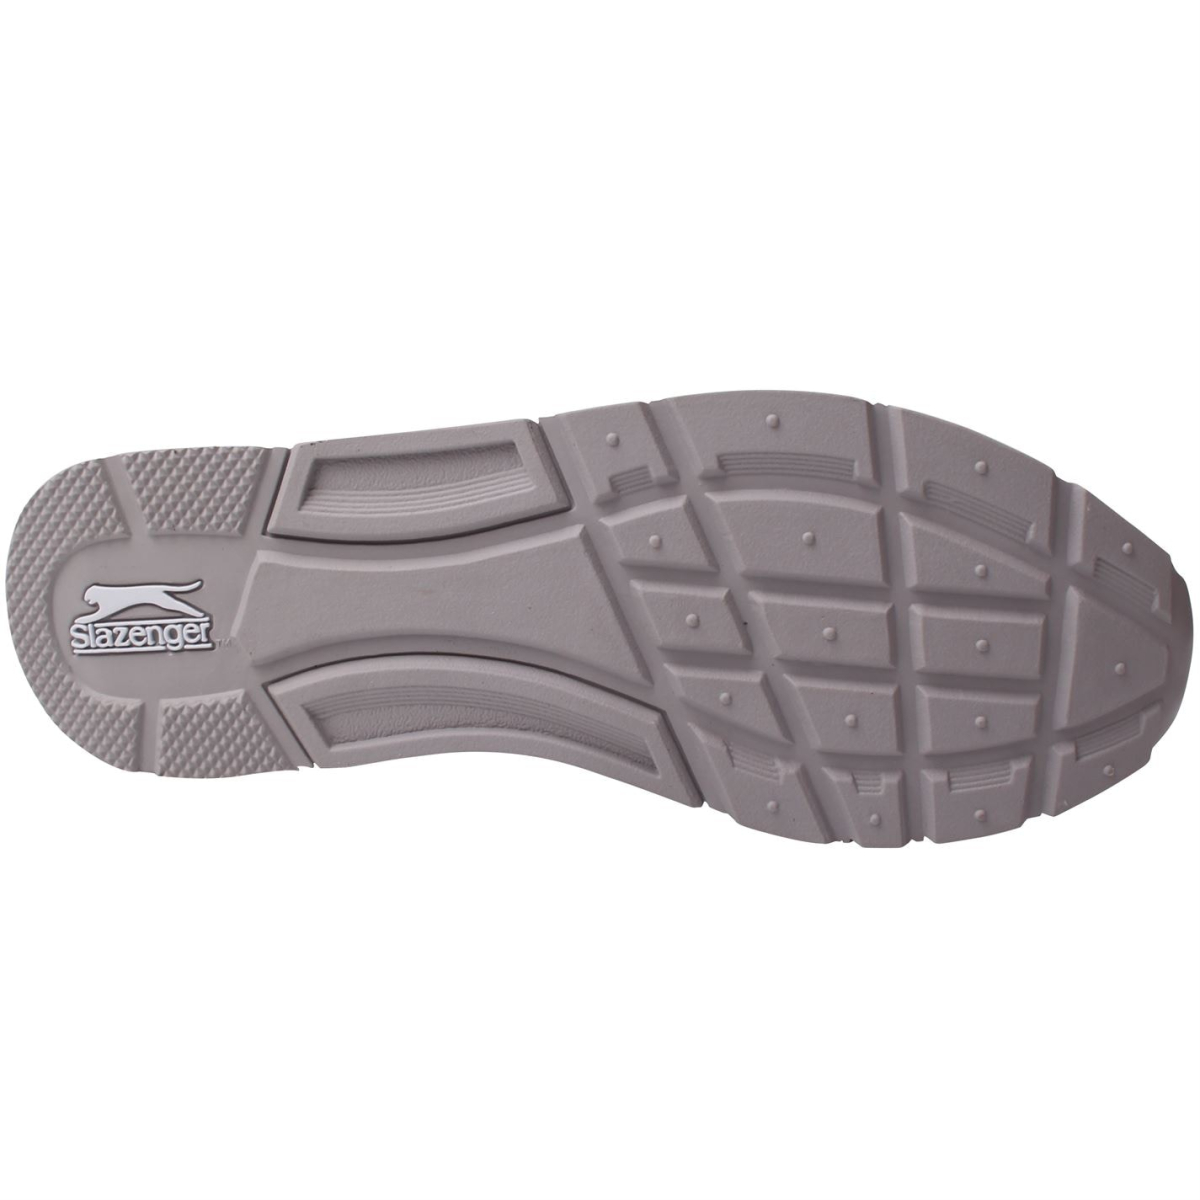 Slazenger-Classic-Turnschuhe-Laufschuhe-Damen-Sportschuhe-Sneaker-1265 Indexbild 24